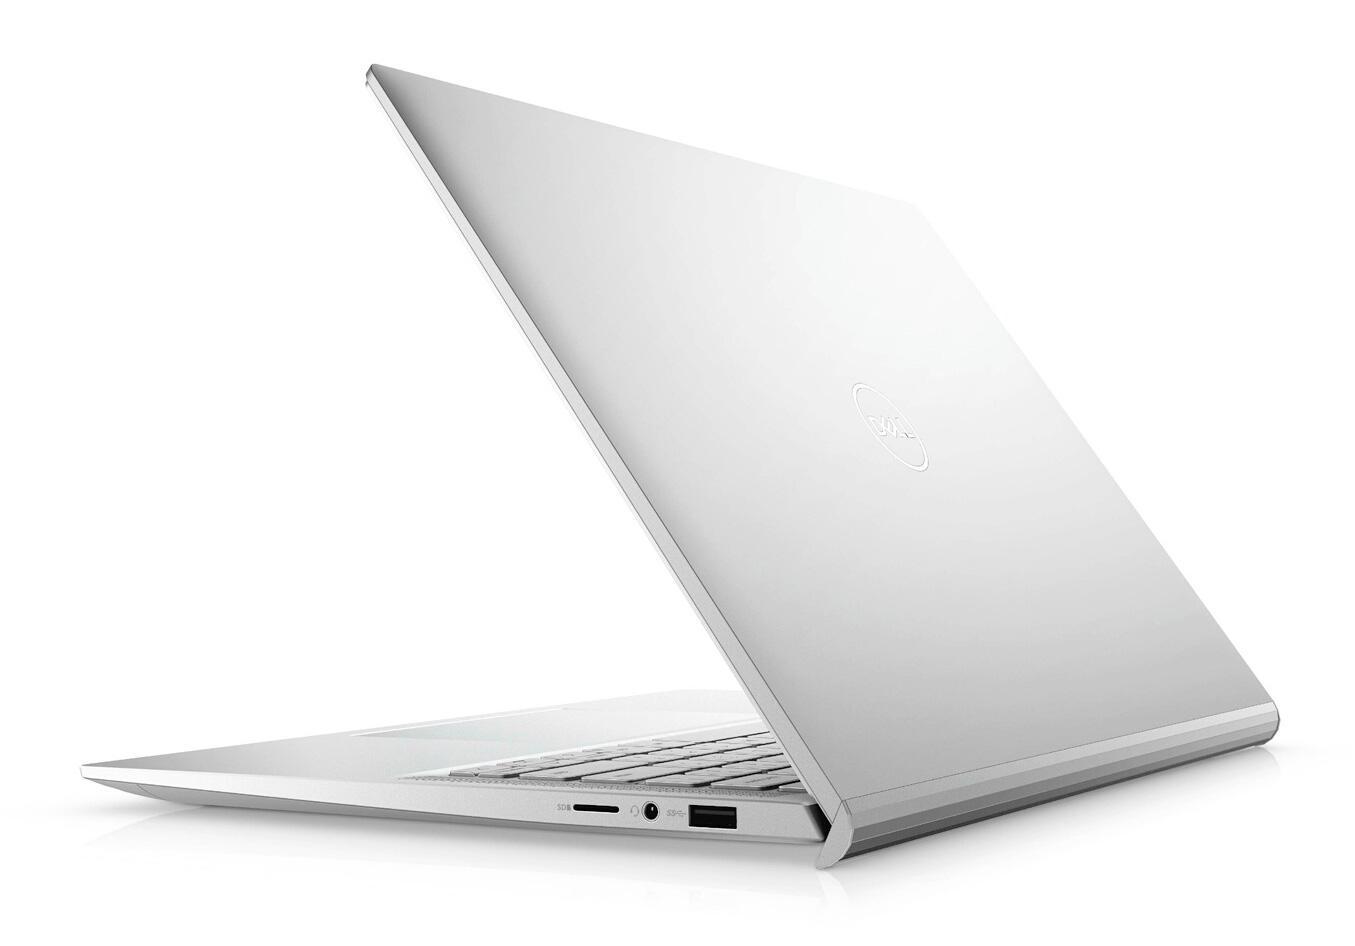 Ordinateur portable Dell Inspiron 14 7400 Argent - QHD+, MX350, Core i7  - photo 4